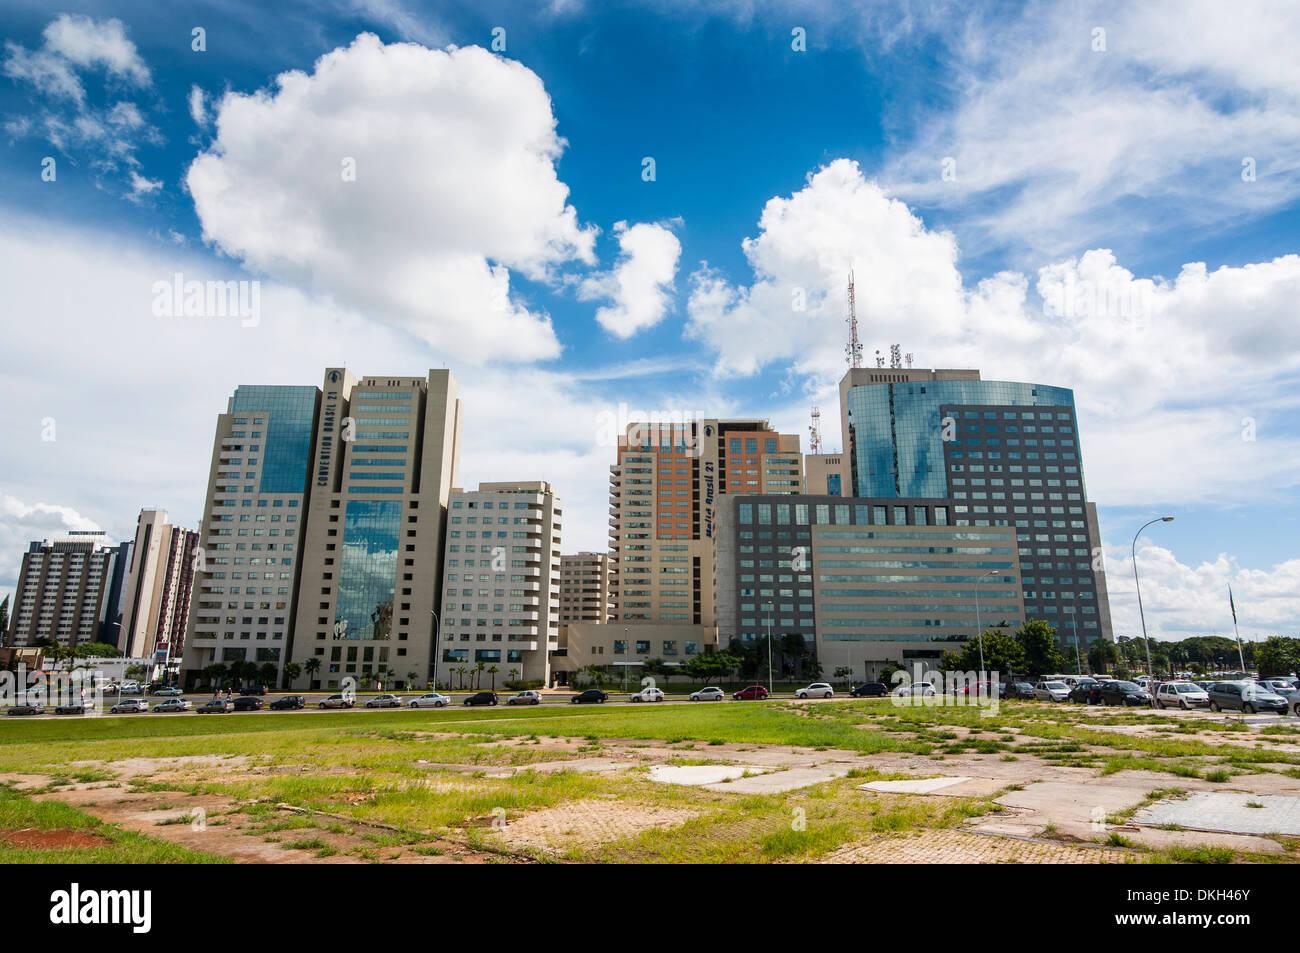 High rise buildings in the center of Brasilia, Brazil, South America - Stock Image